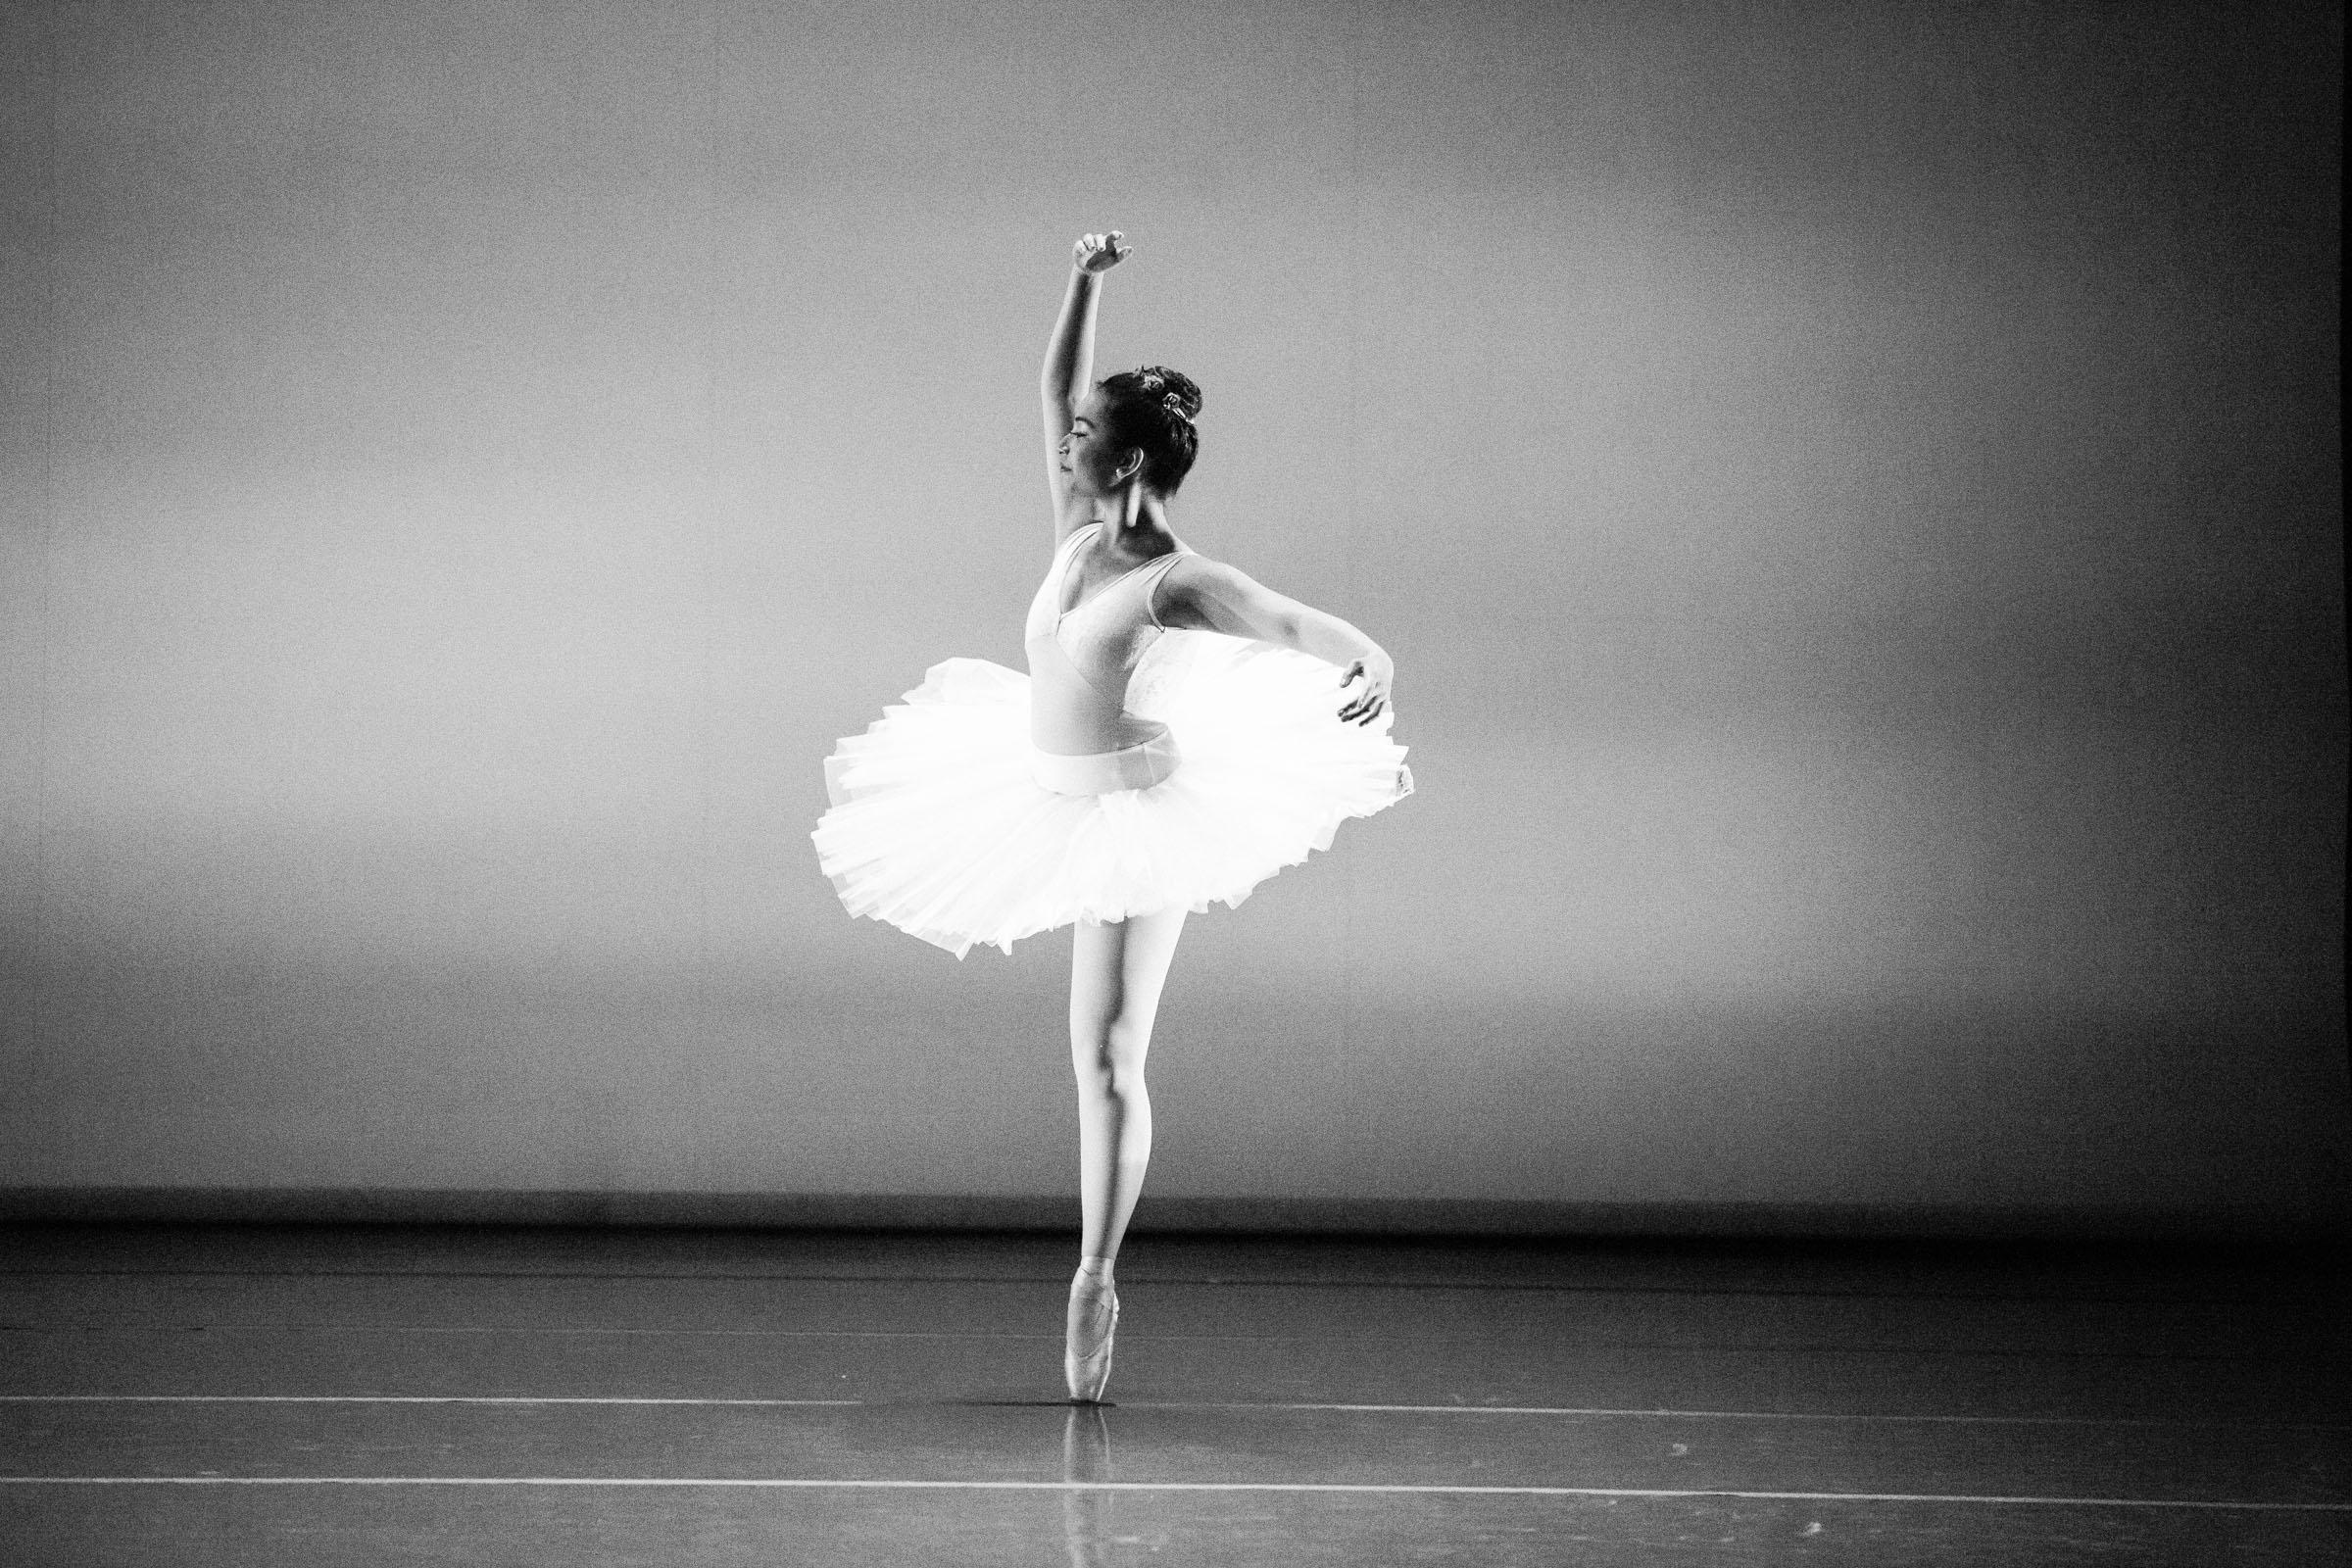 Ballet dancer in black and white